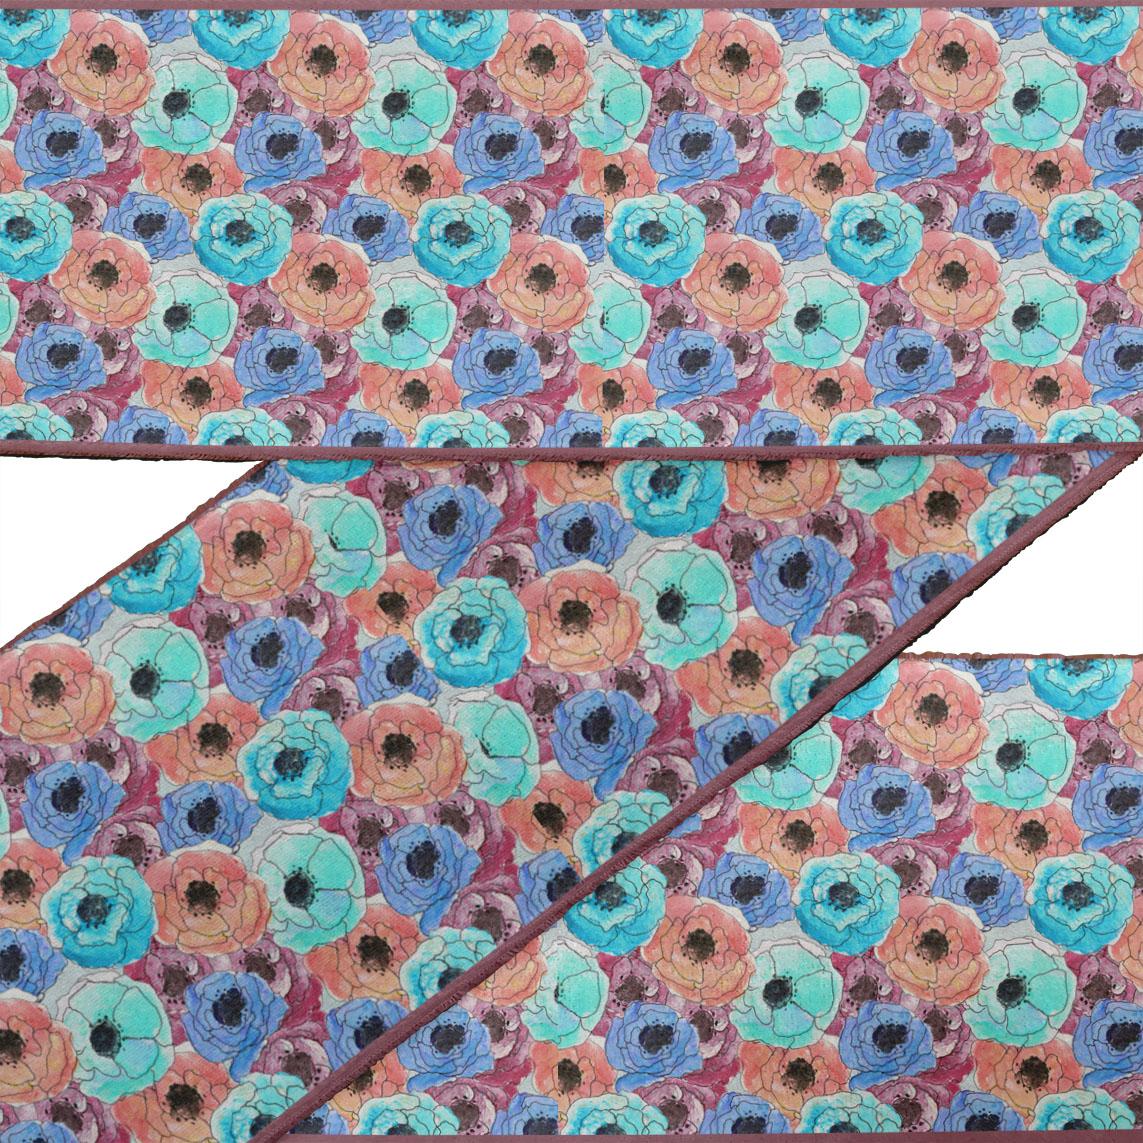 RibbonTrim Fabric Laces For Crafts Printed VelvetTrim9